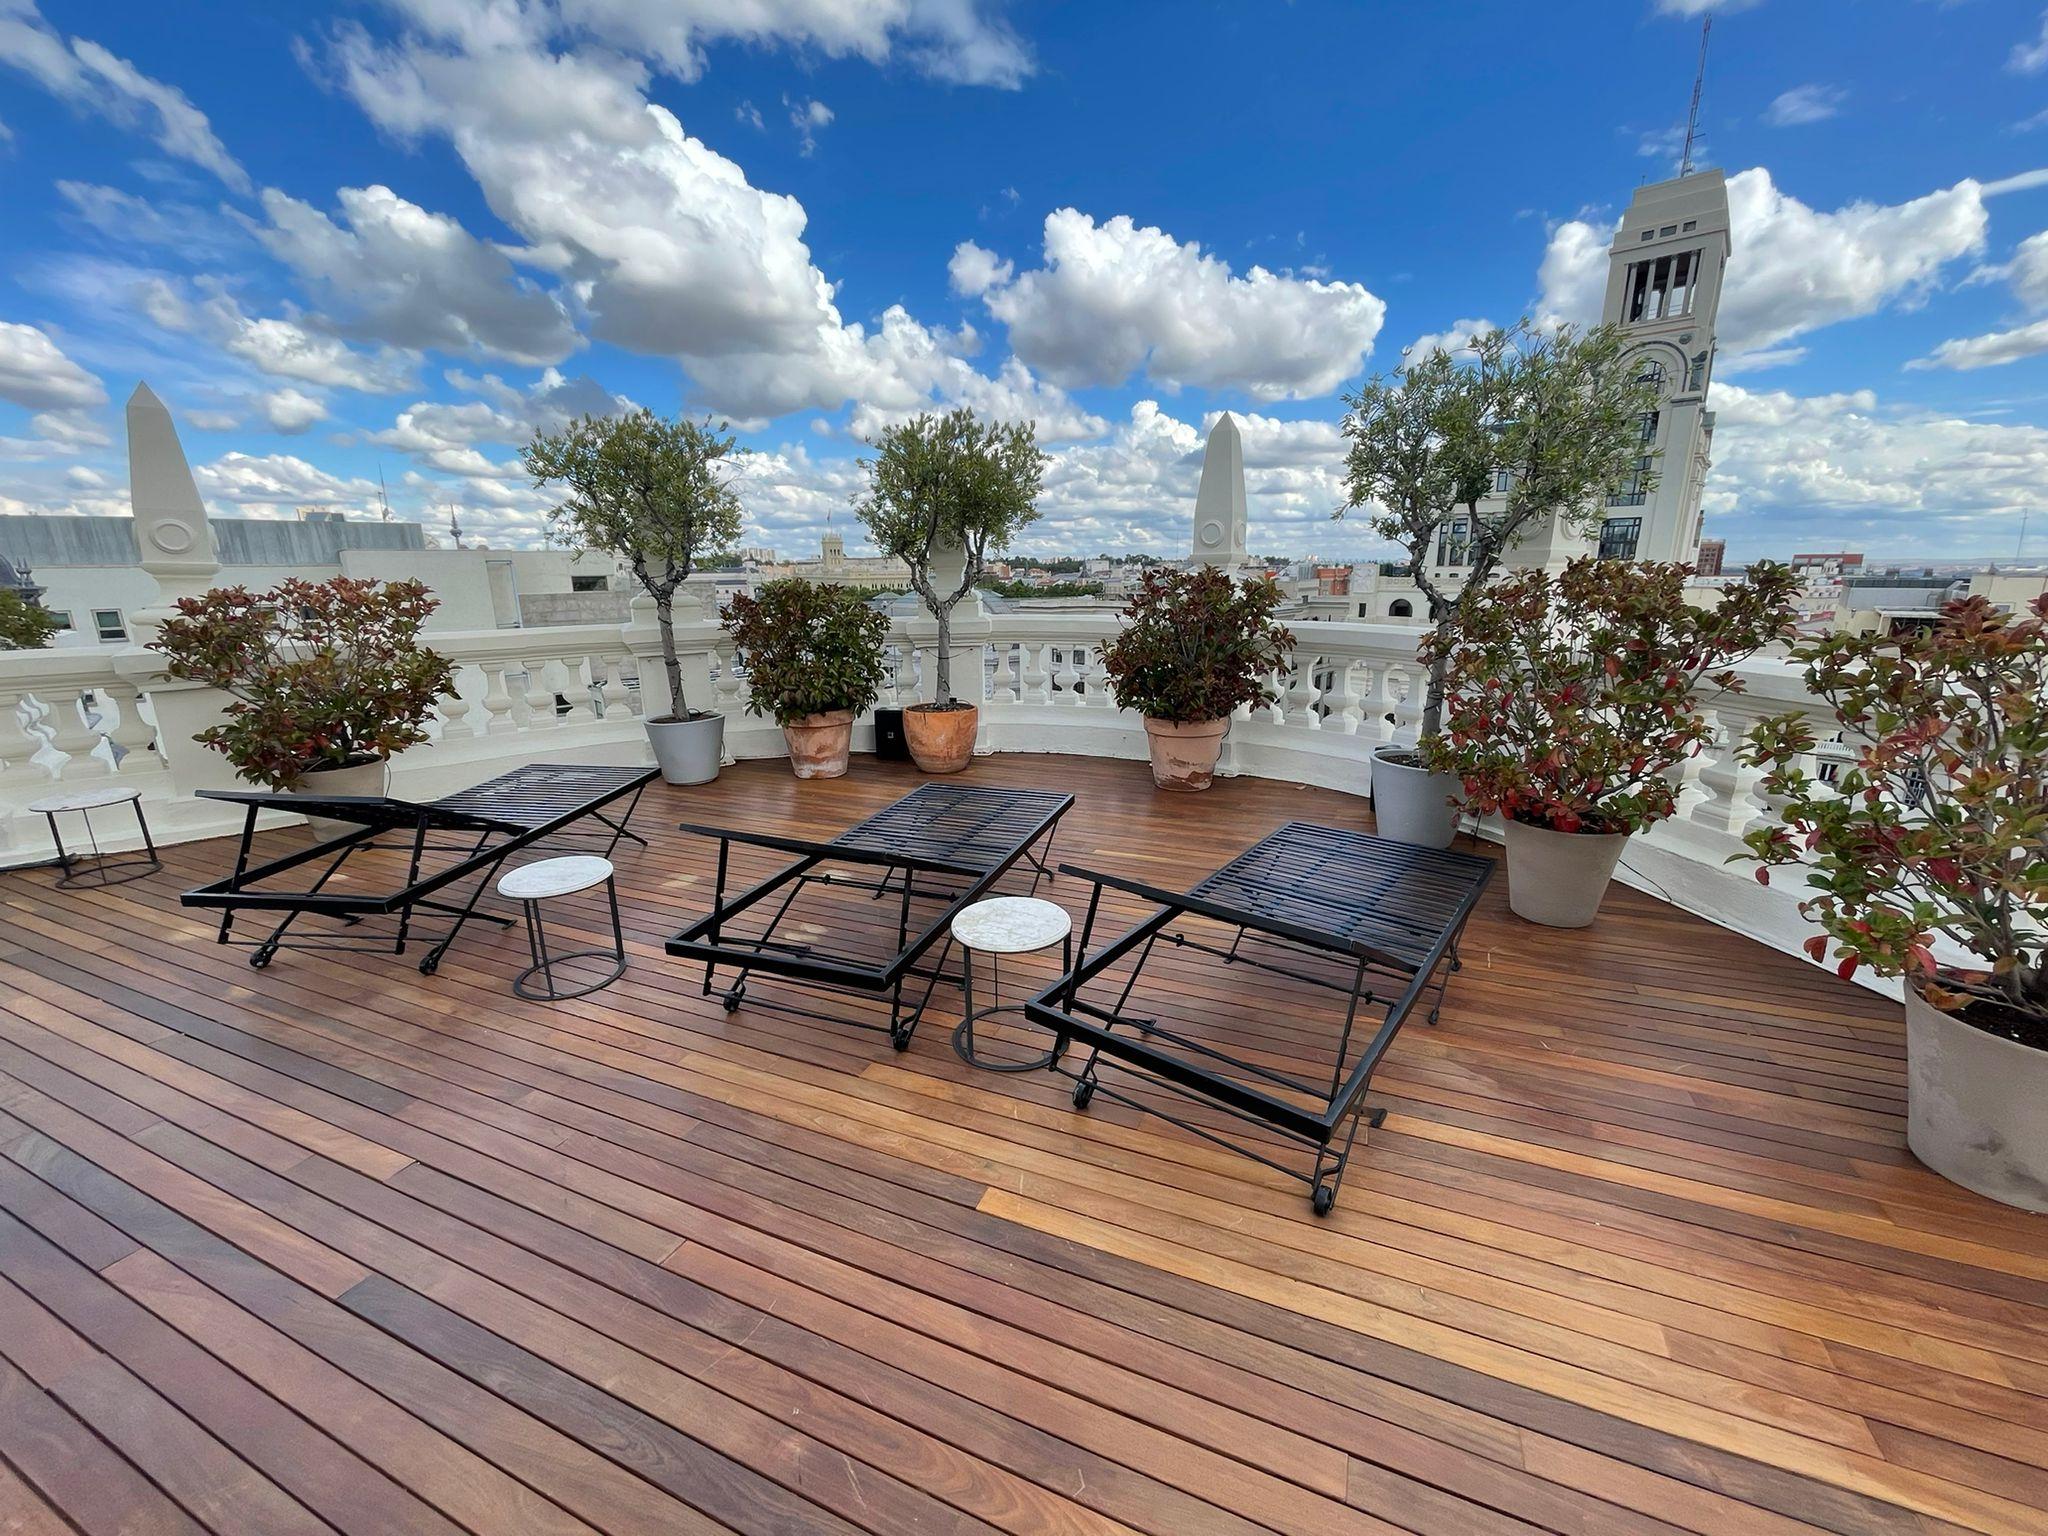 Exterpark Outdoorparkett in IPE 5-Sterne Hotel Madrid